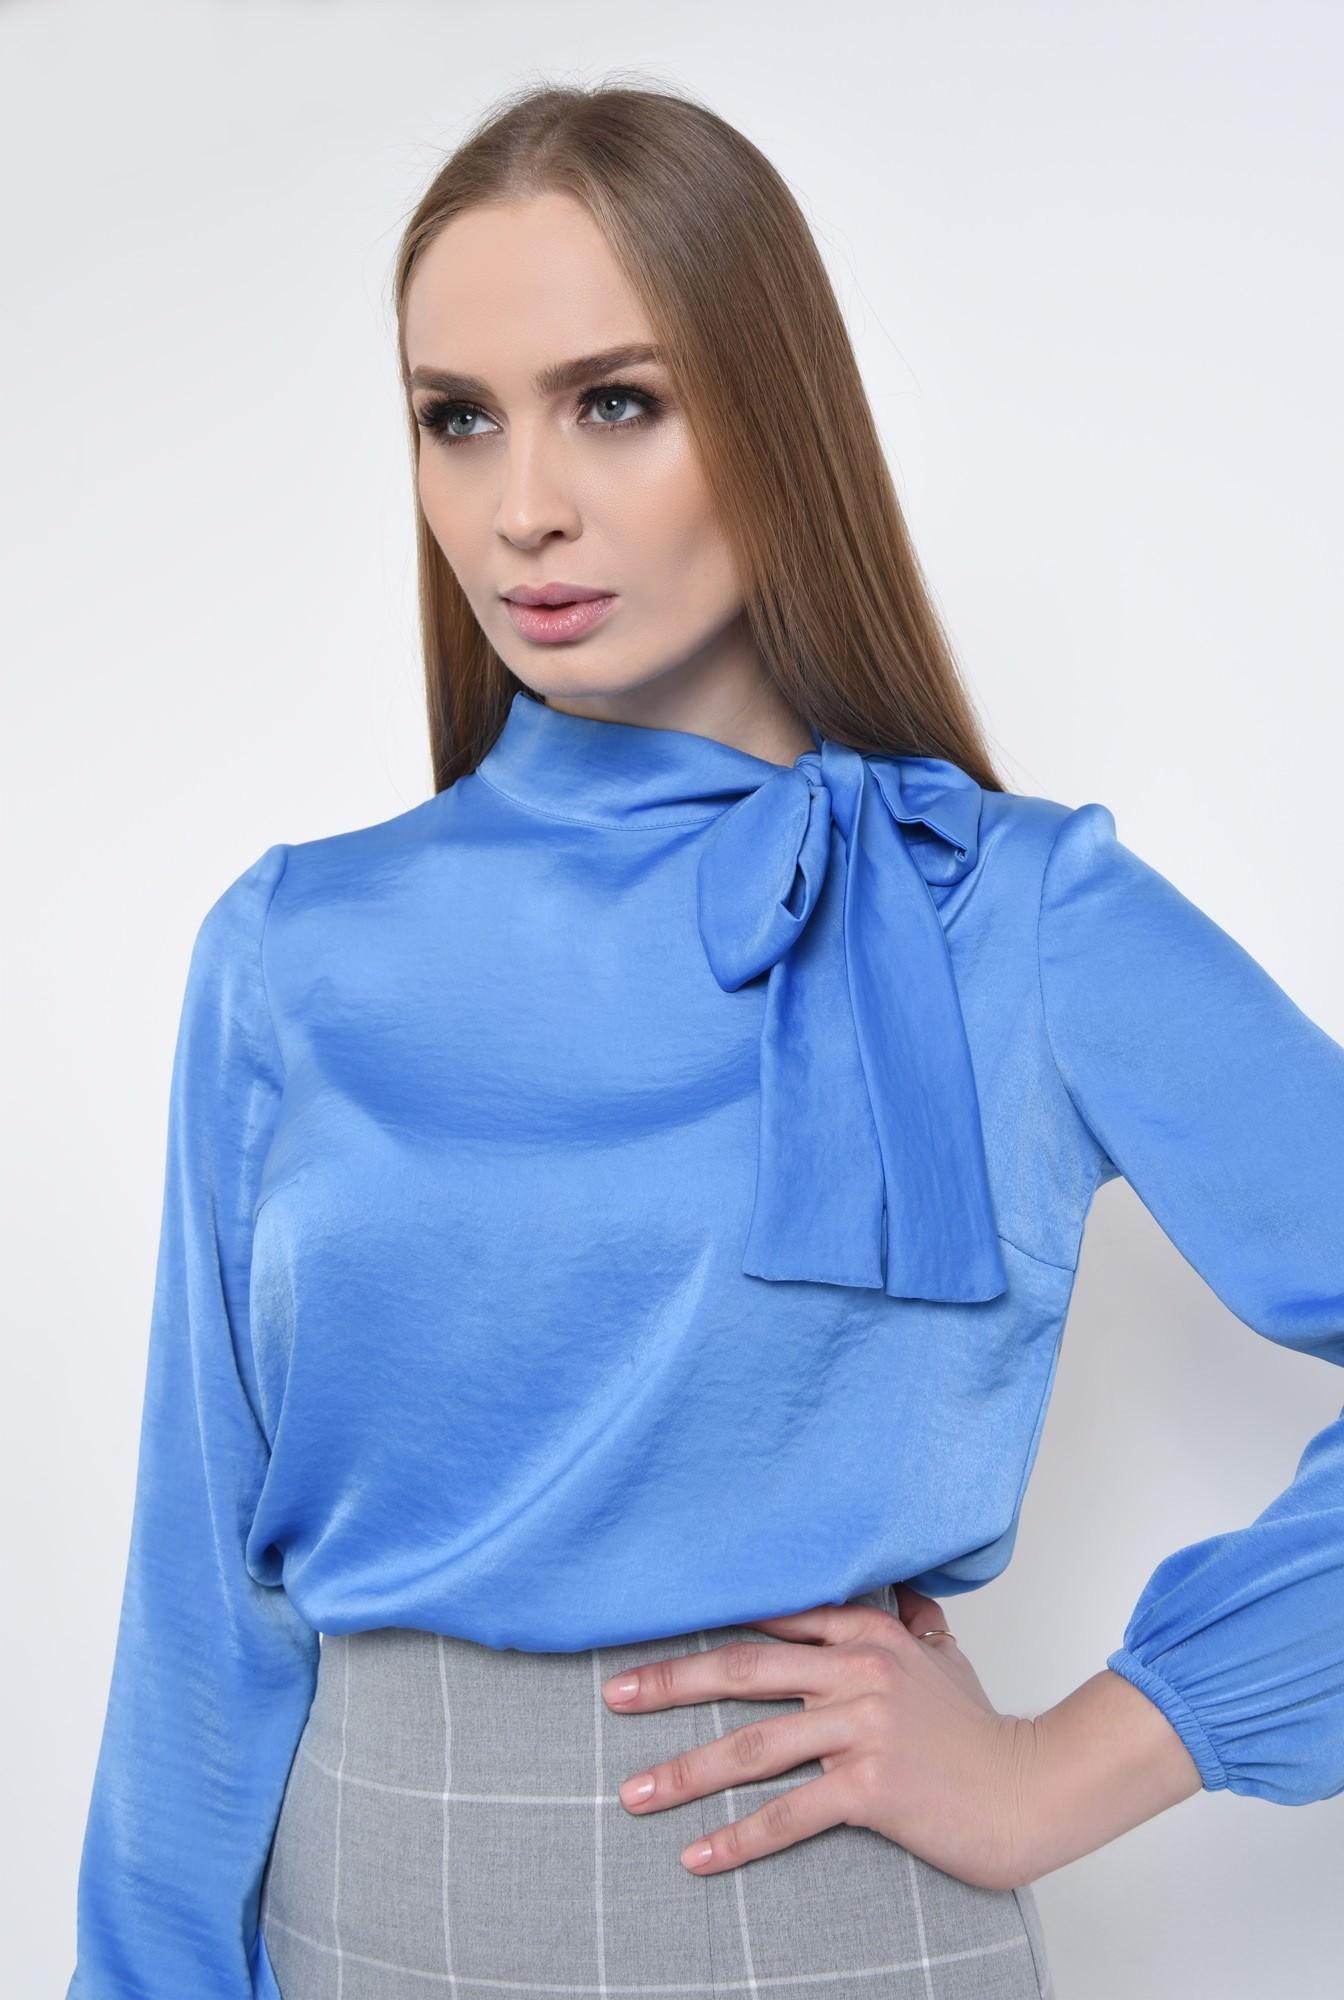 2 - bluza office, bleu, satinata, maneci lungi